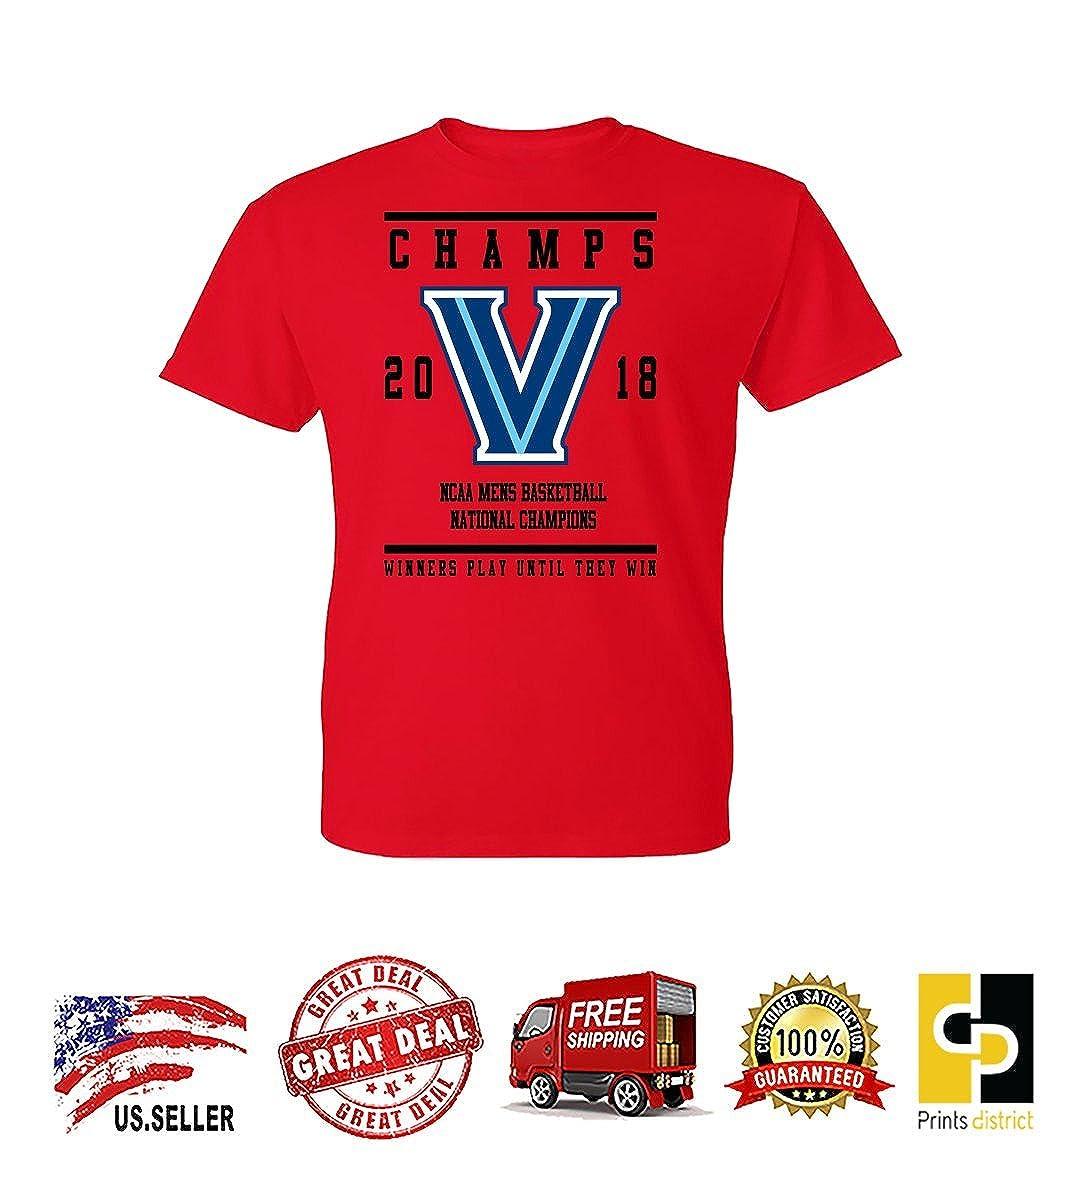 677355ab Amazon.com: Prints District Villanova Basketball Champions Winners Play  Untill They Win Mens t-Shirt: Clothing